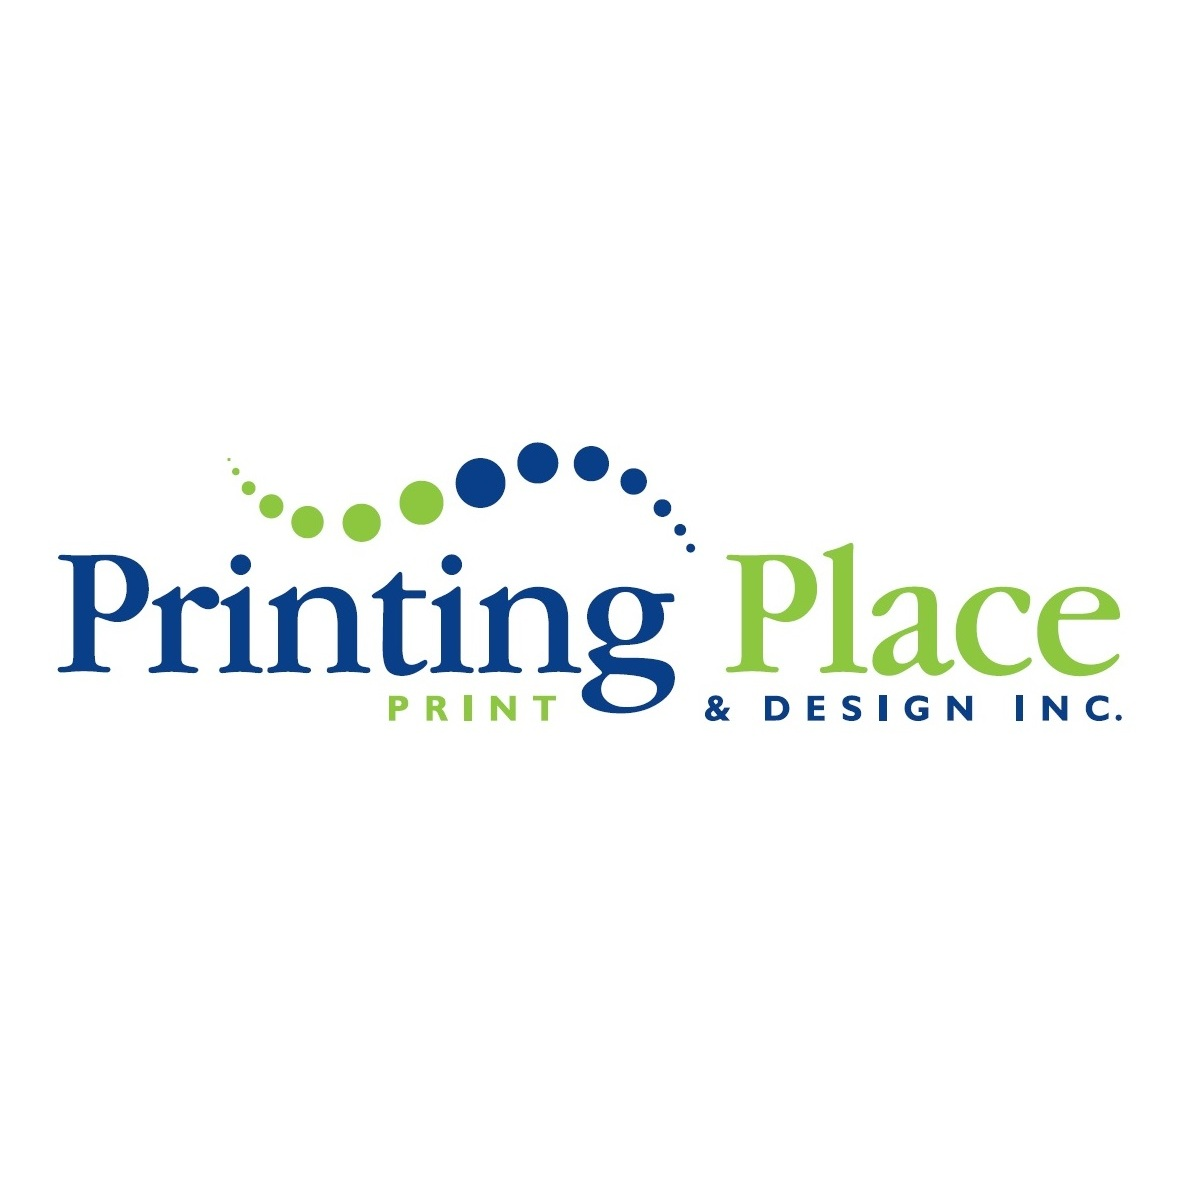 Printing Place